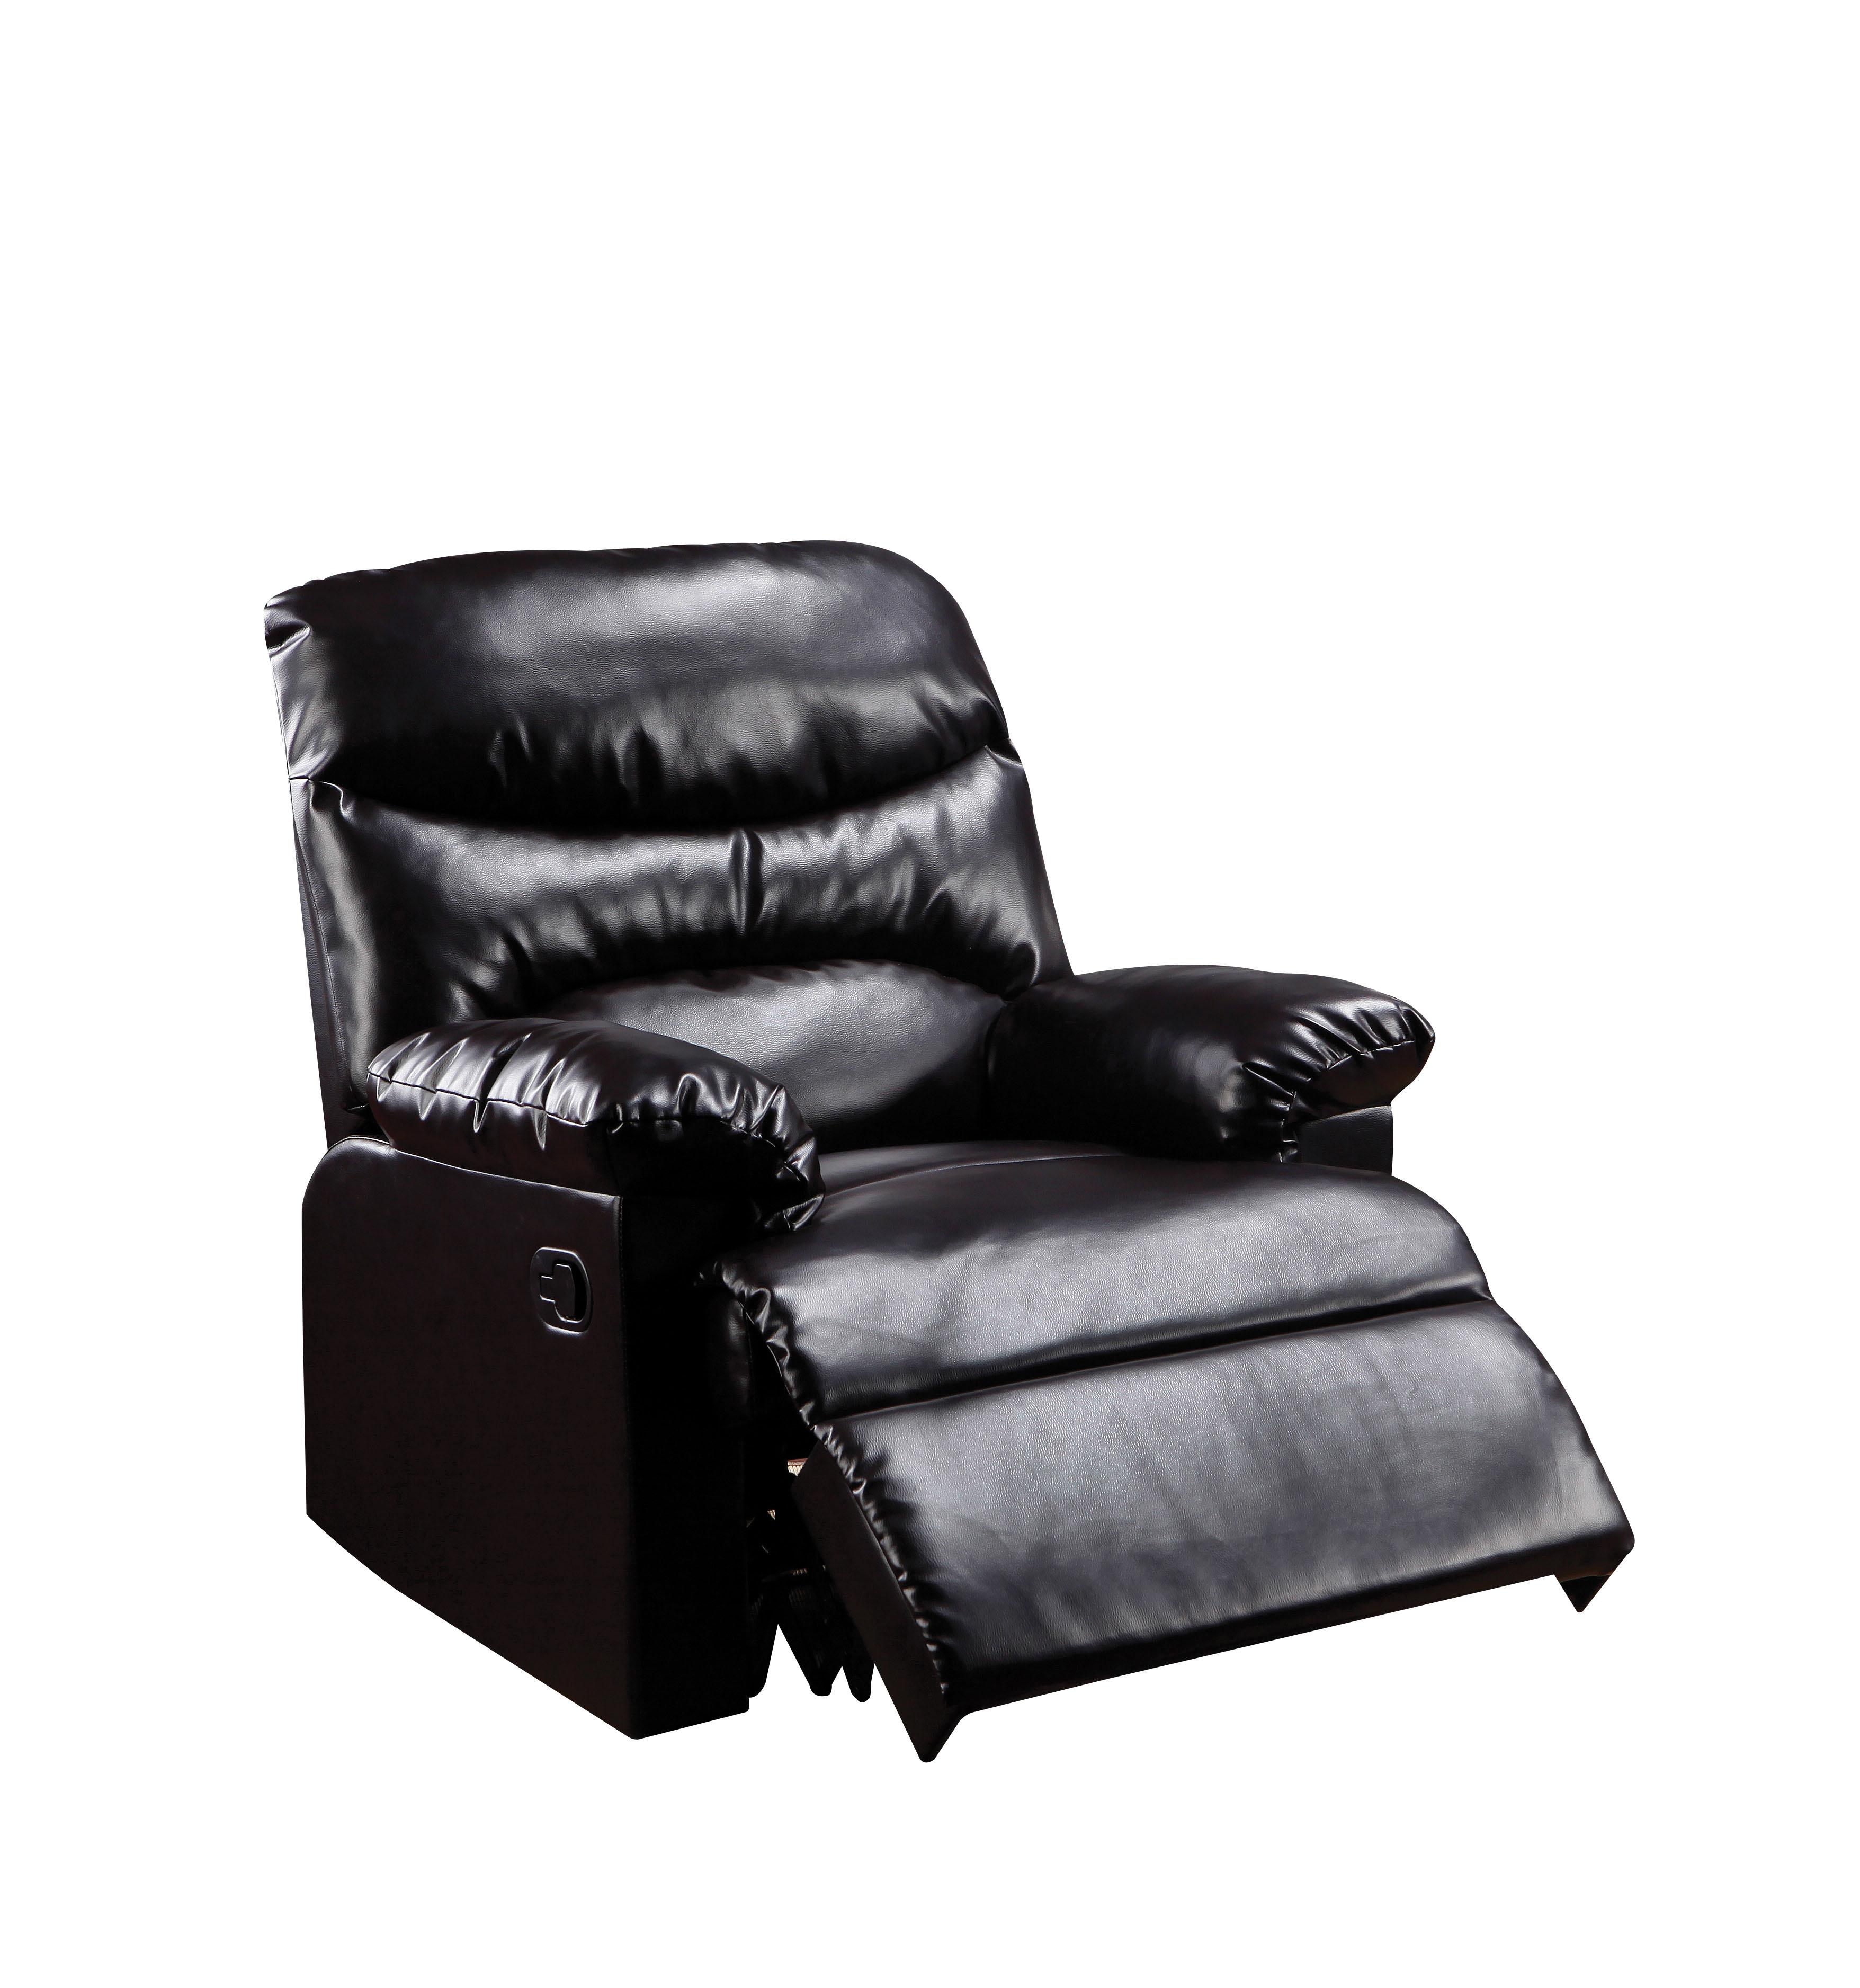 Acme Furniture Arcadia Recliner in Espresso Bonded Leather